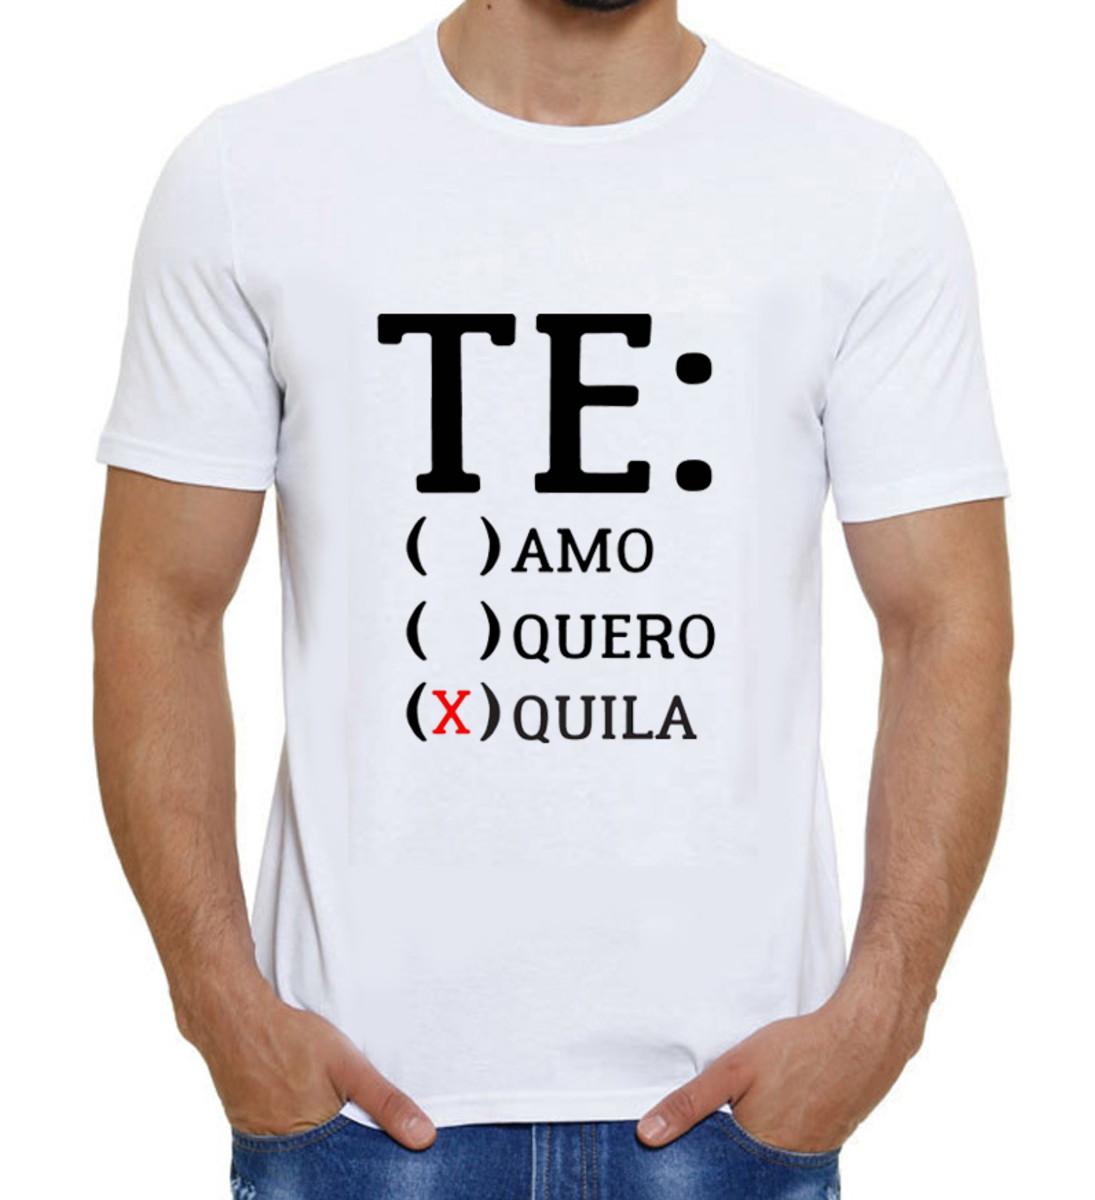 Camiseta Tequila Alternativa Te Amo Te Quero Tequila no Elo7 ... 7513b2d522825